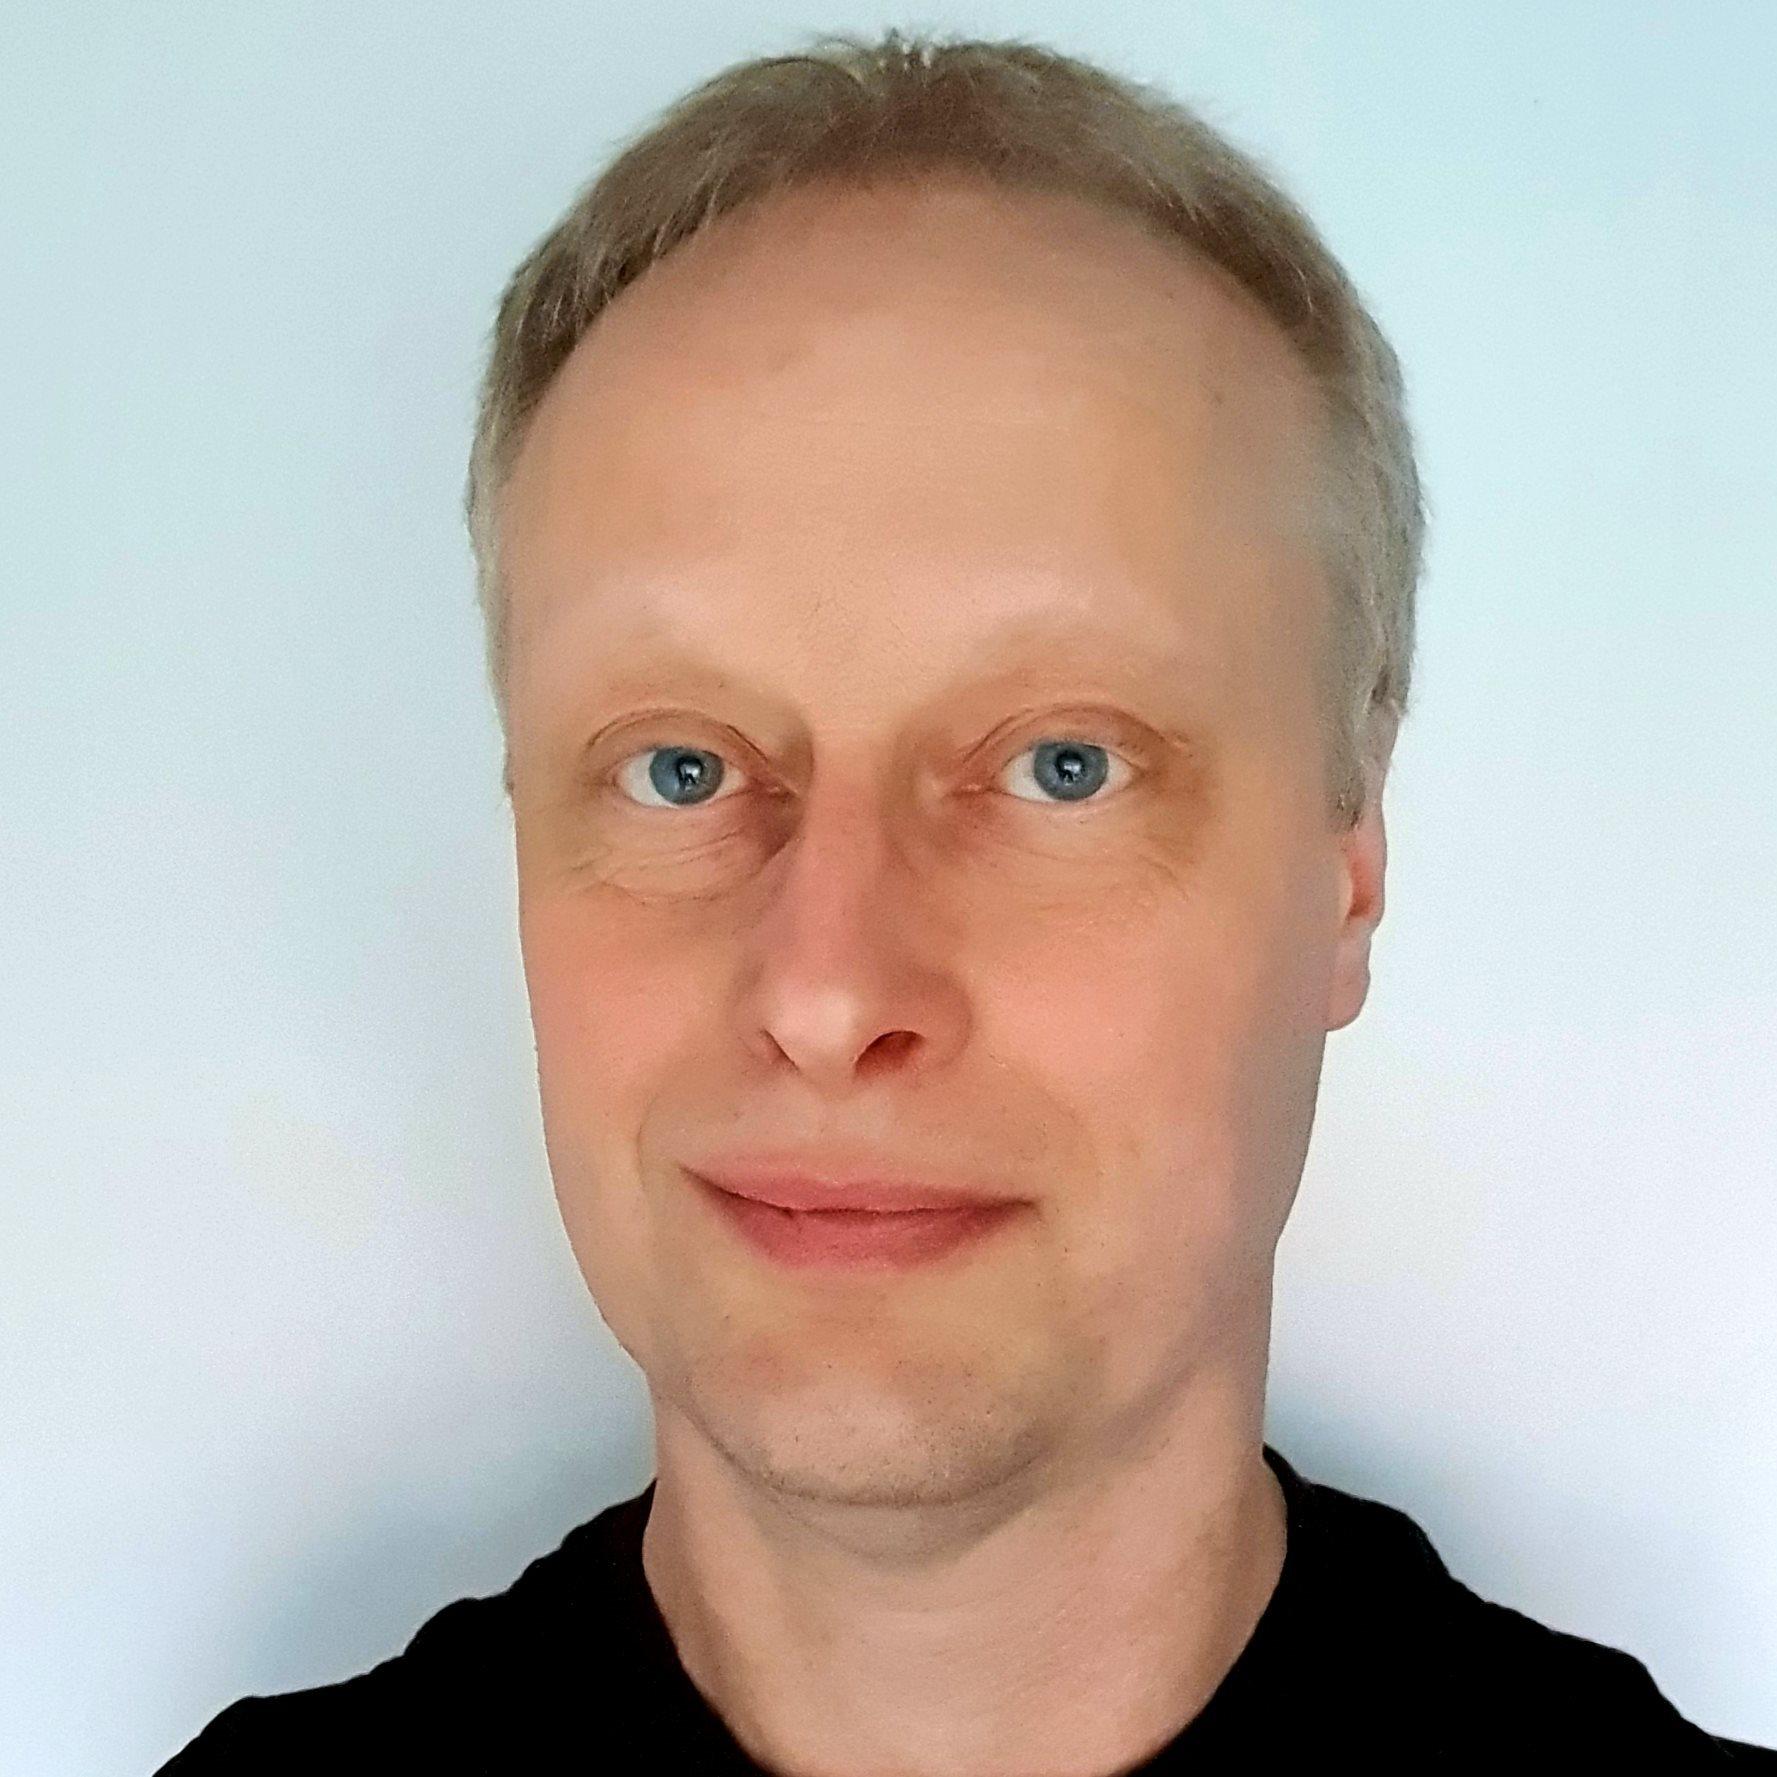 Mats Gustavsson